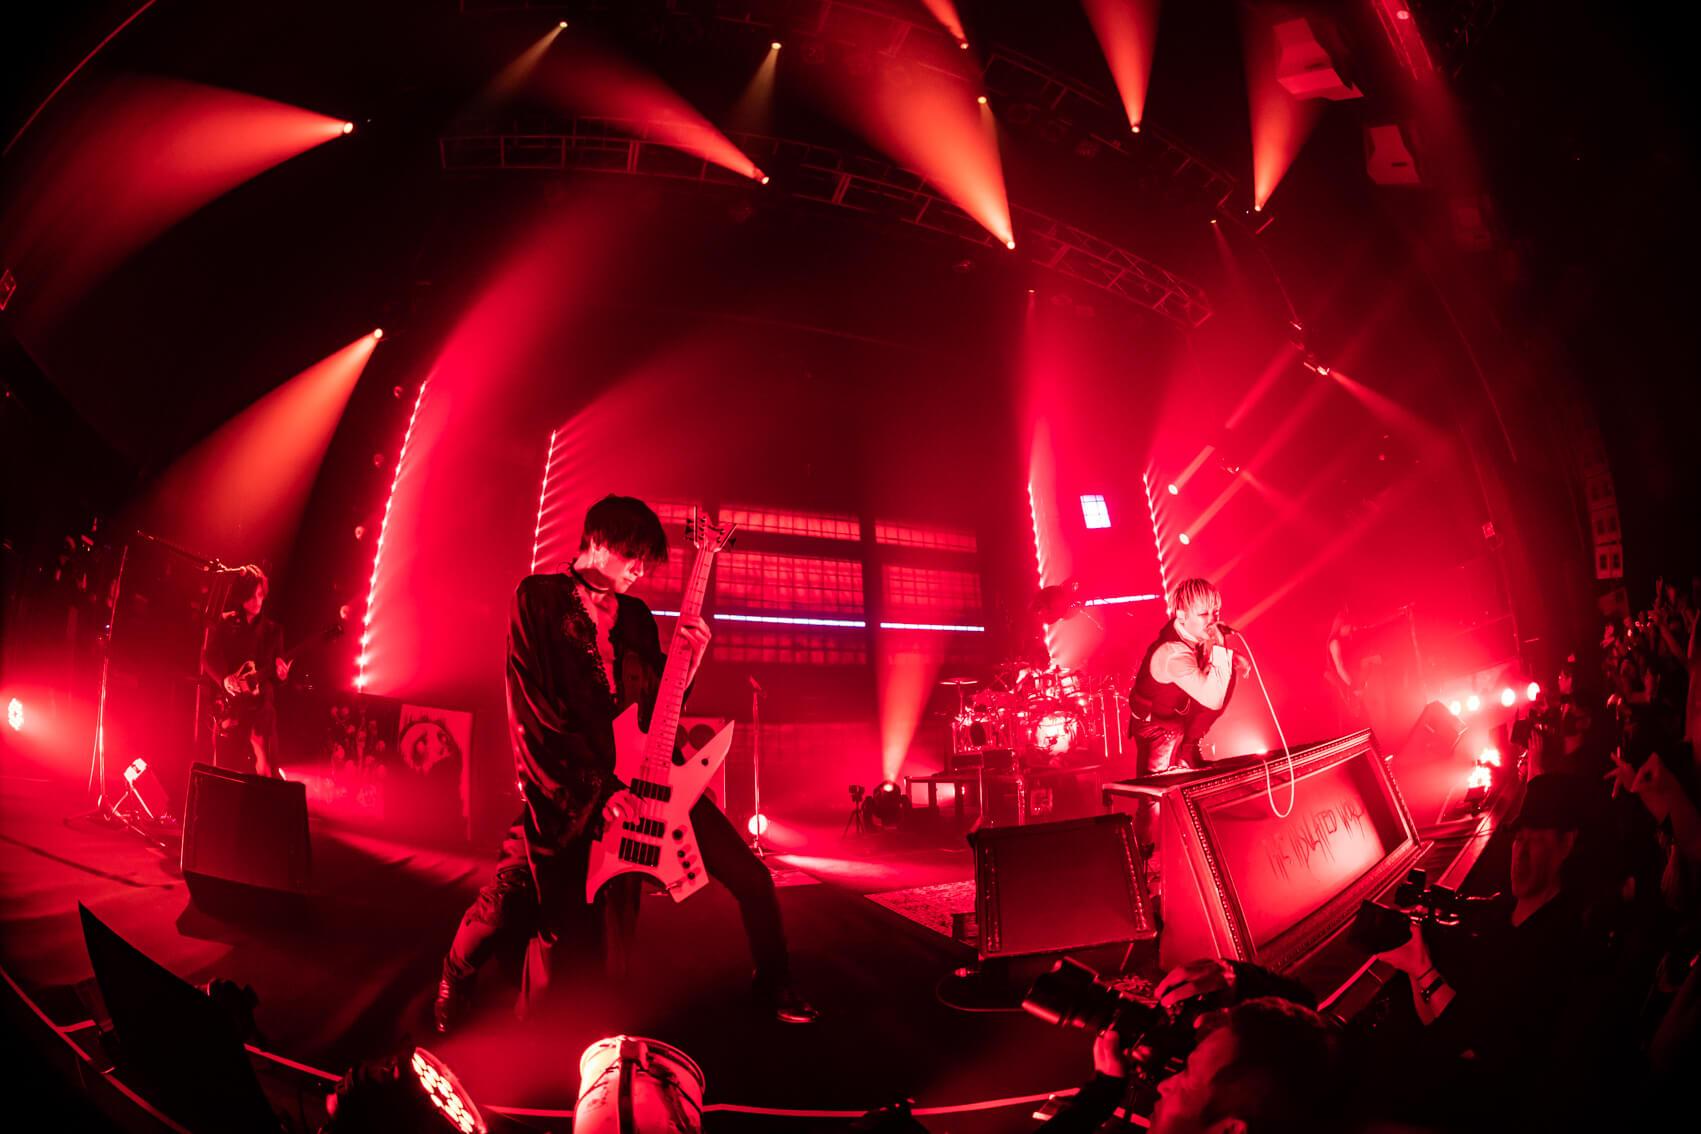 DIR EN GREY、30thシングルリリース&6カ国10公演のヨーロッパツアー開催